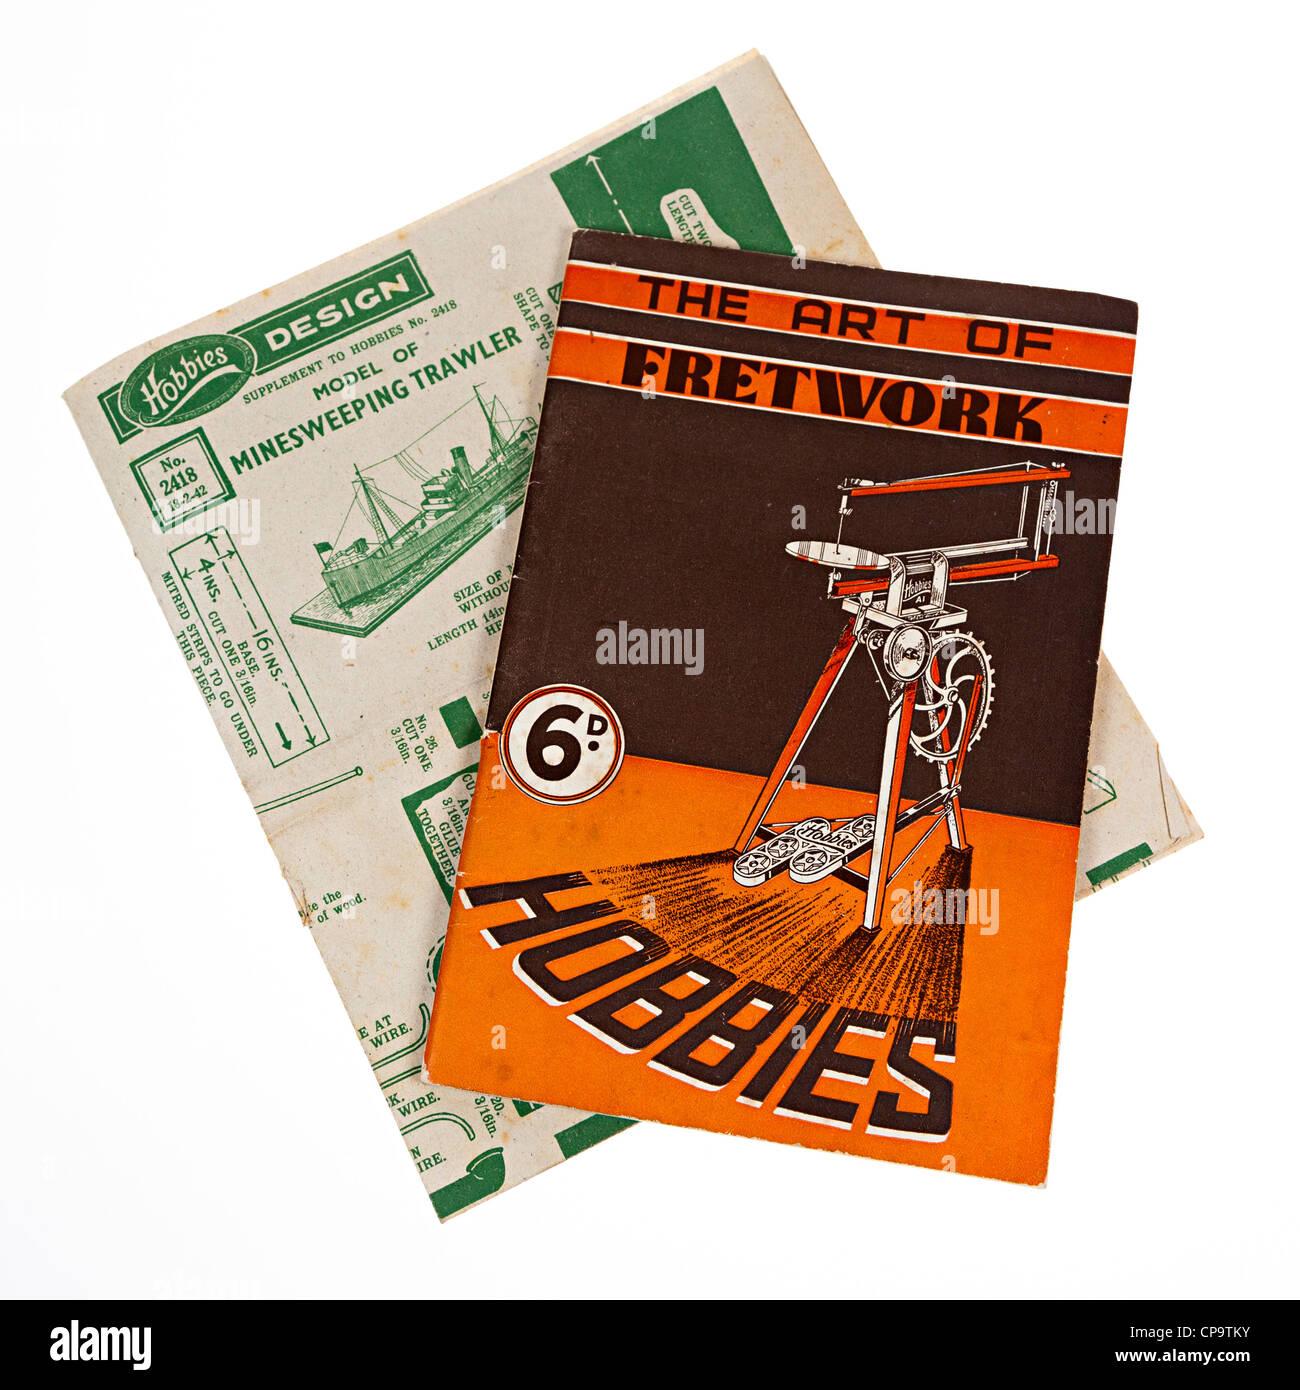 Fretwork hobbies d'adresses et plans, 1940, UK Photo Stock